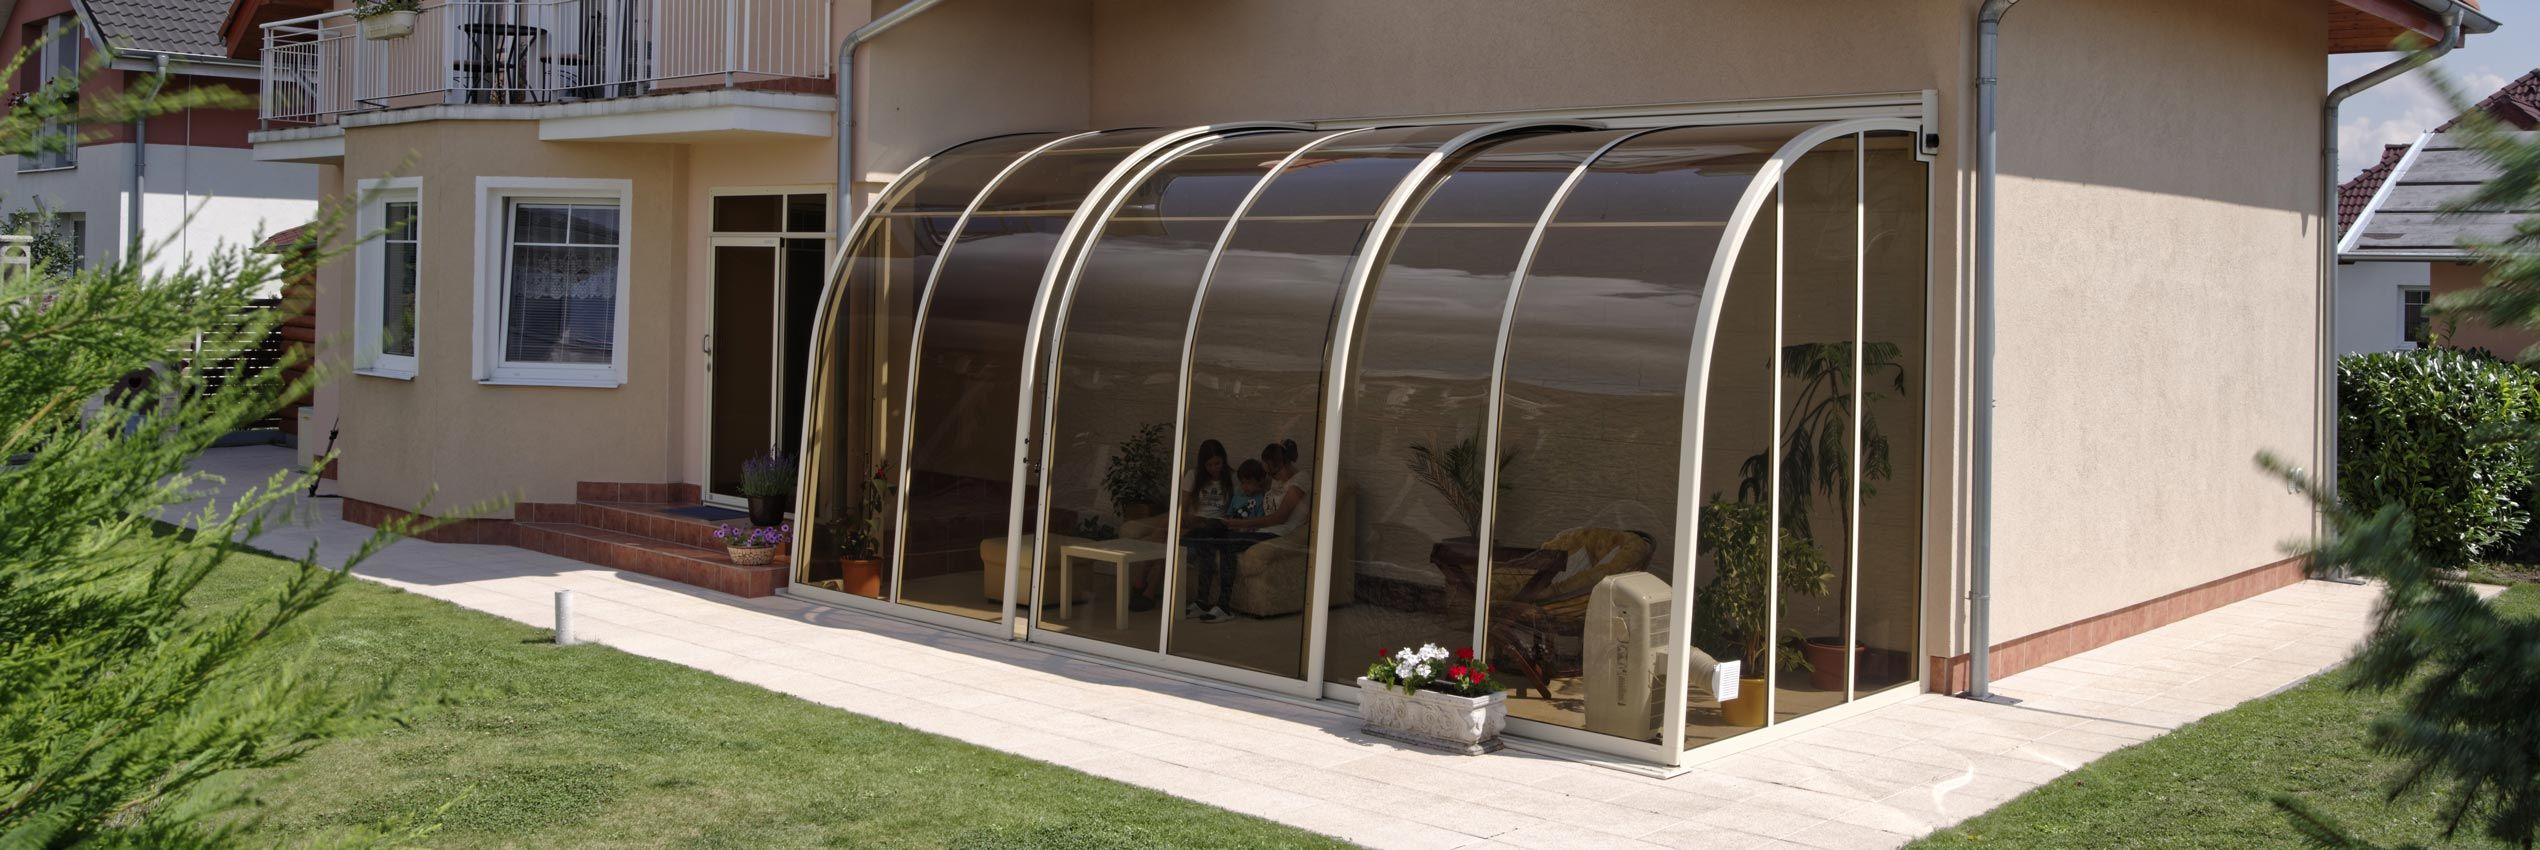 abri de terrasse ferm id es de design. Black Bedroom Furniture Sets. Home Design Ideas